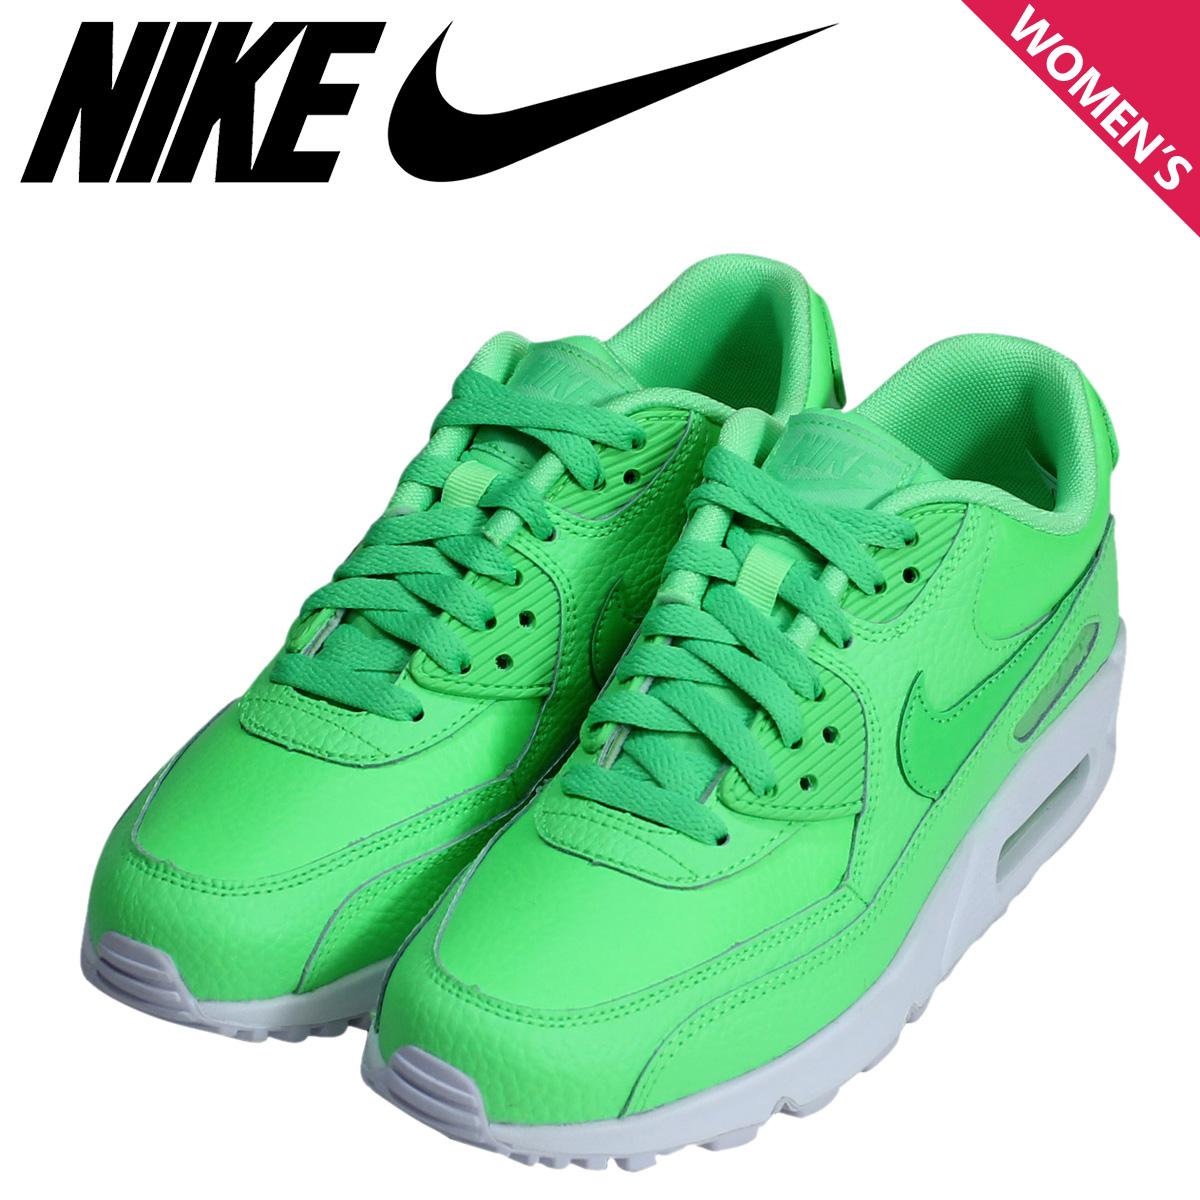 the best attitude ec793 d29ef Nike NIKE Air Max 90 essential Lady's sneakers AIR MAX 90 MESH GS mesh  724,821-300 green